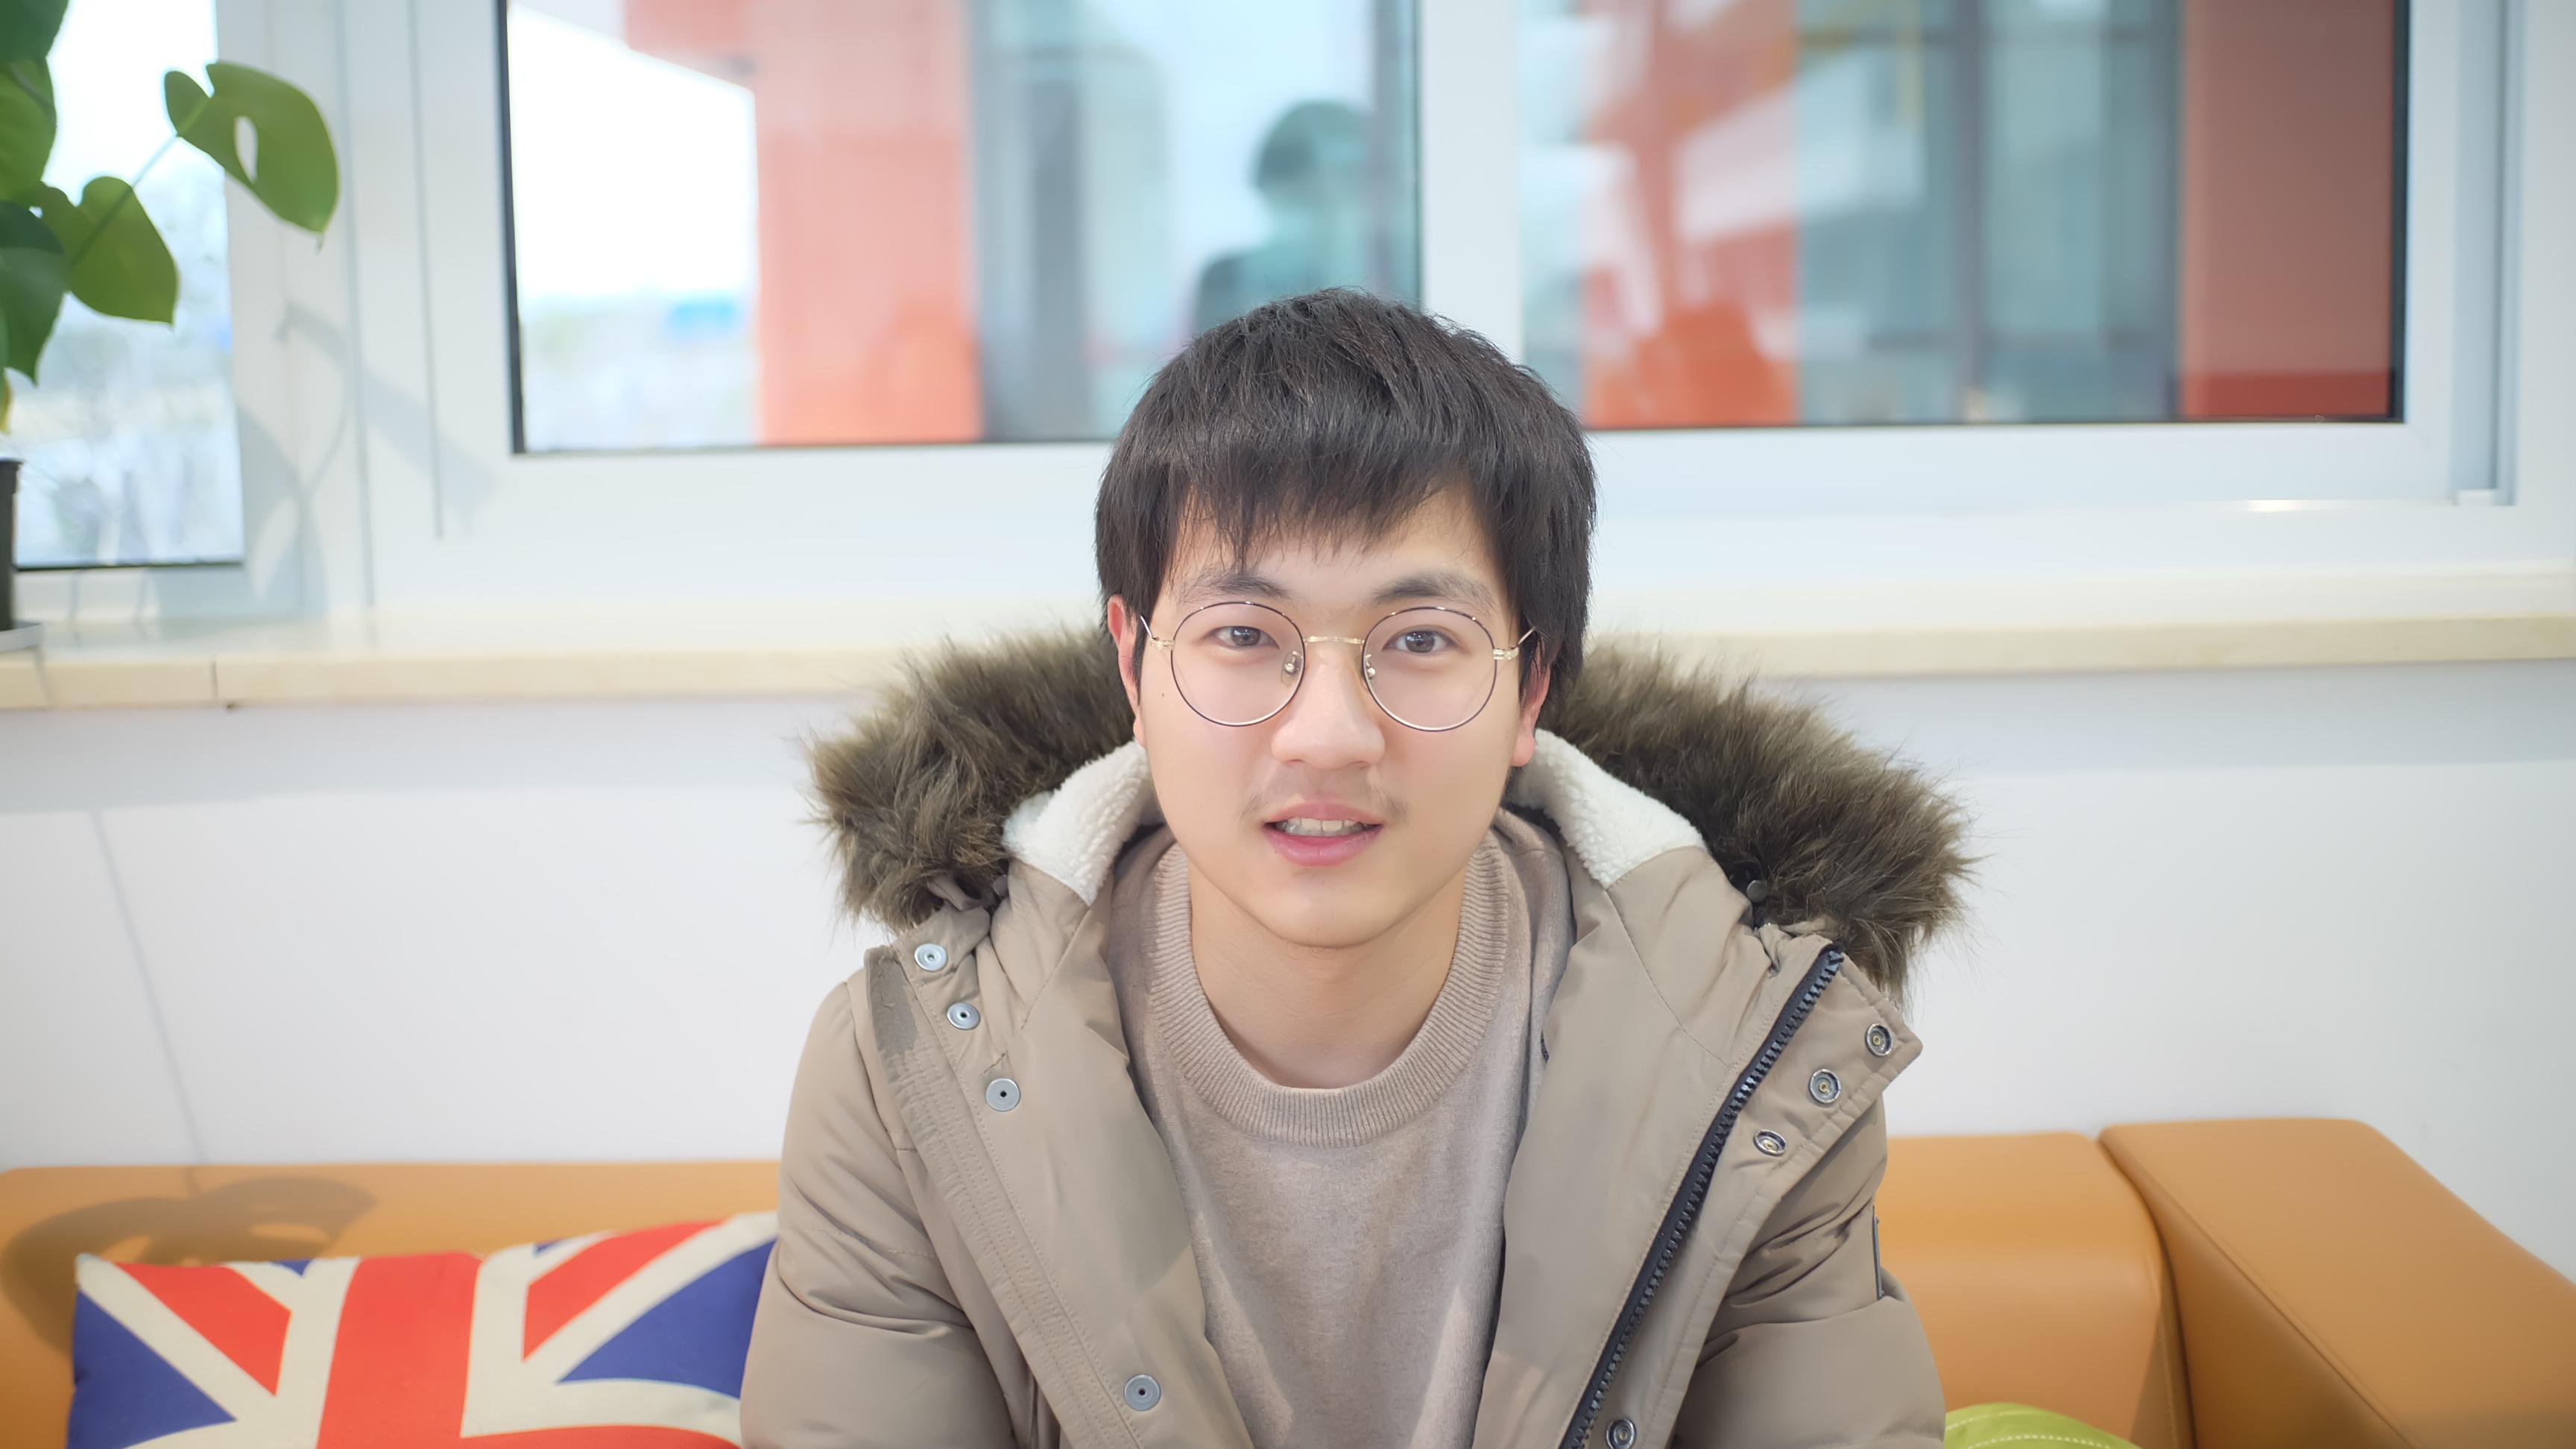 International engineering student holds patent